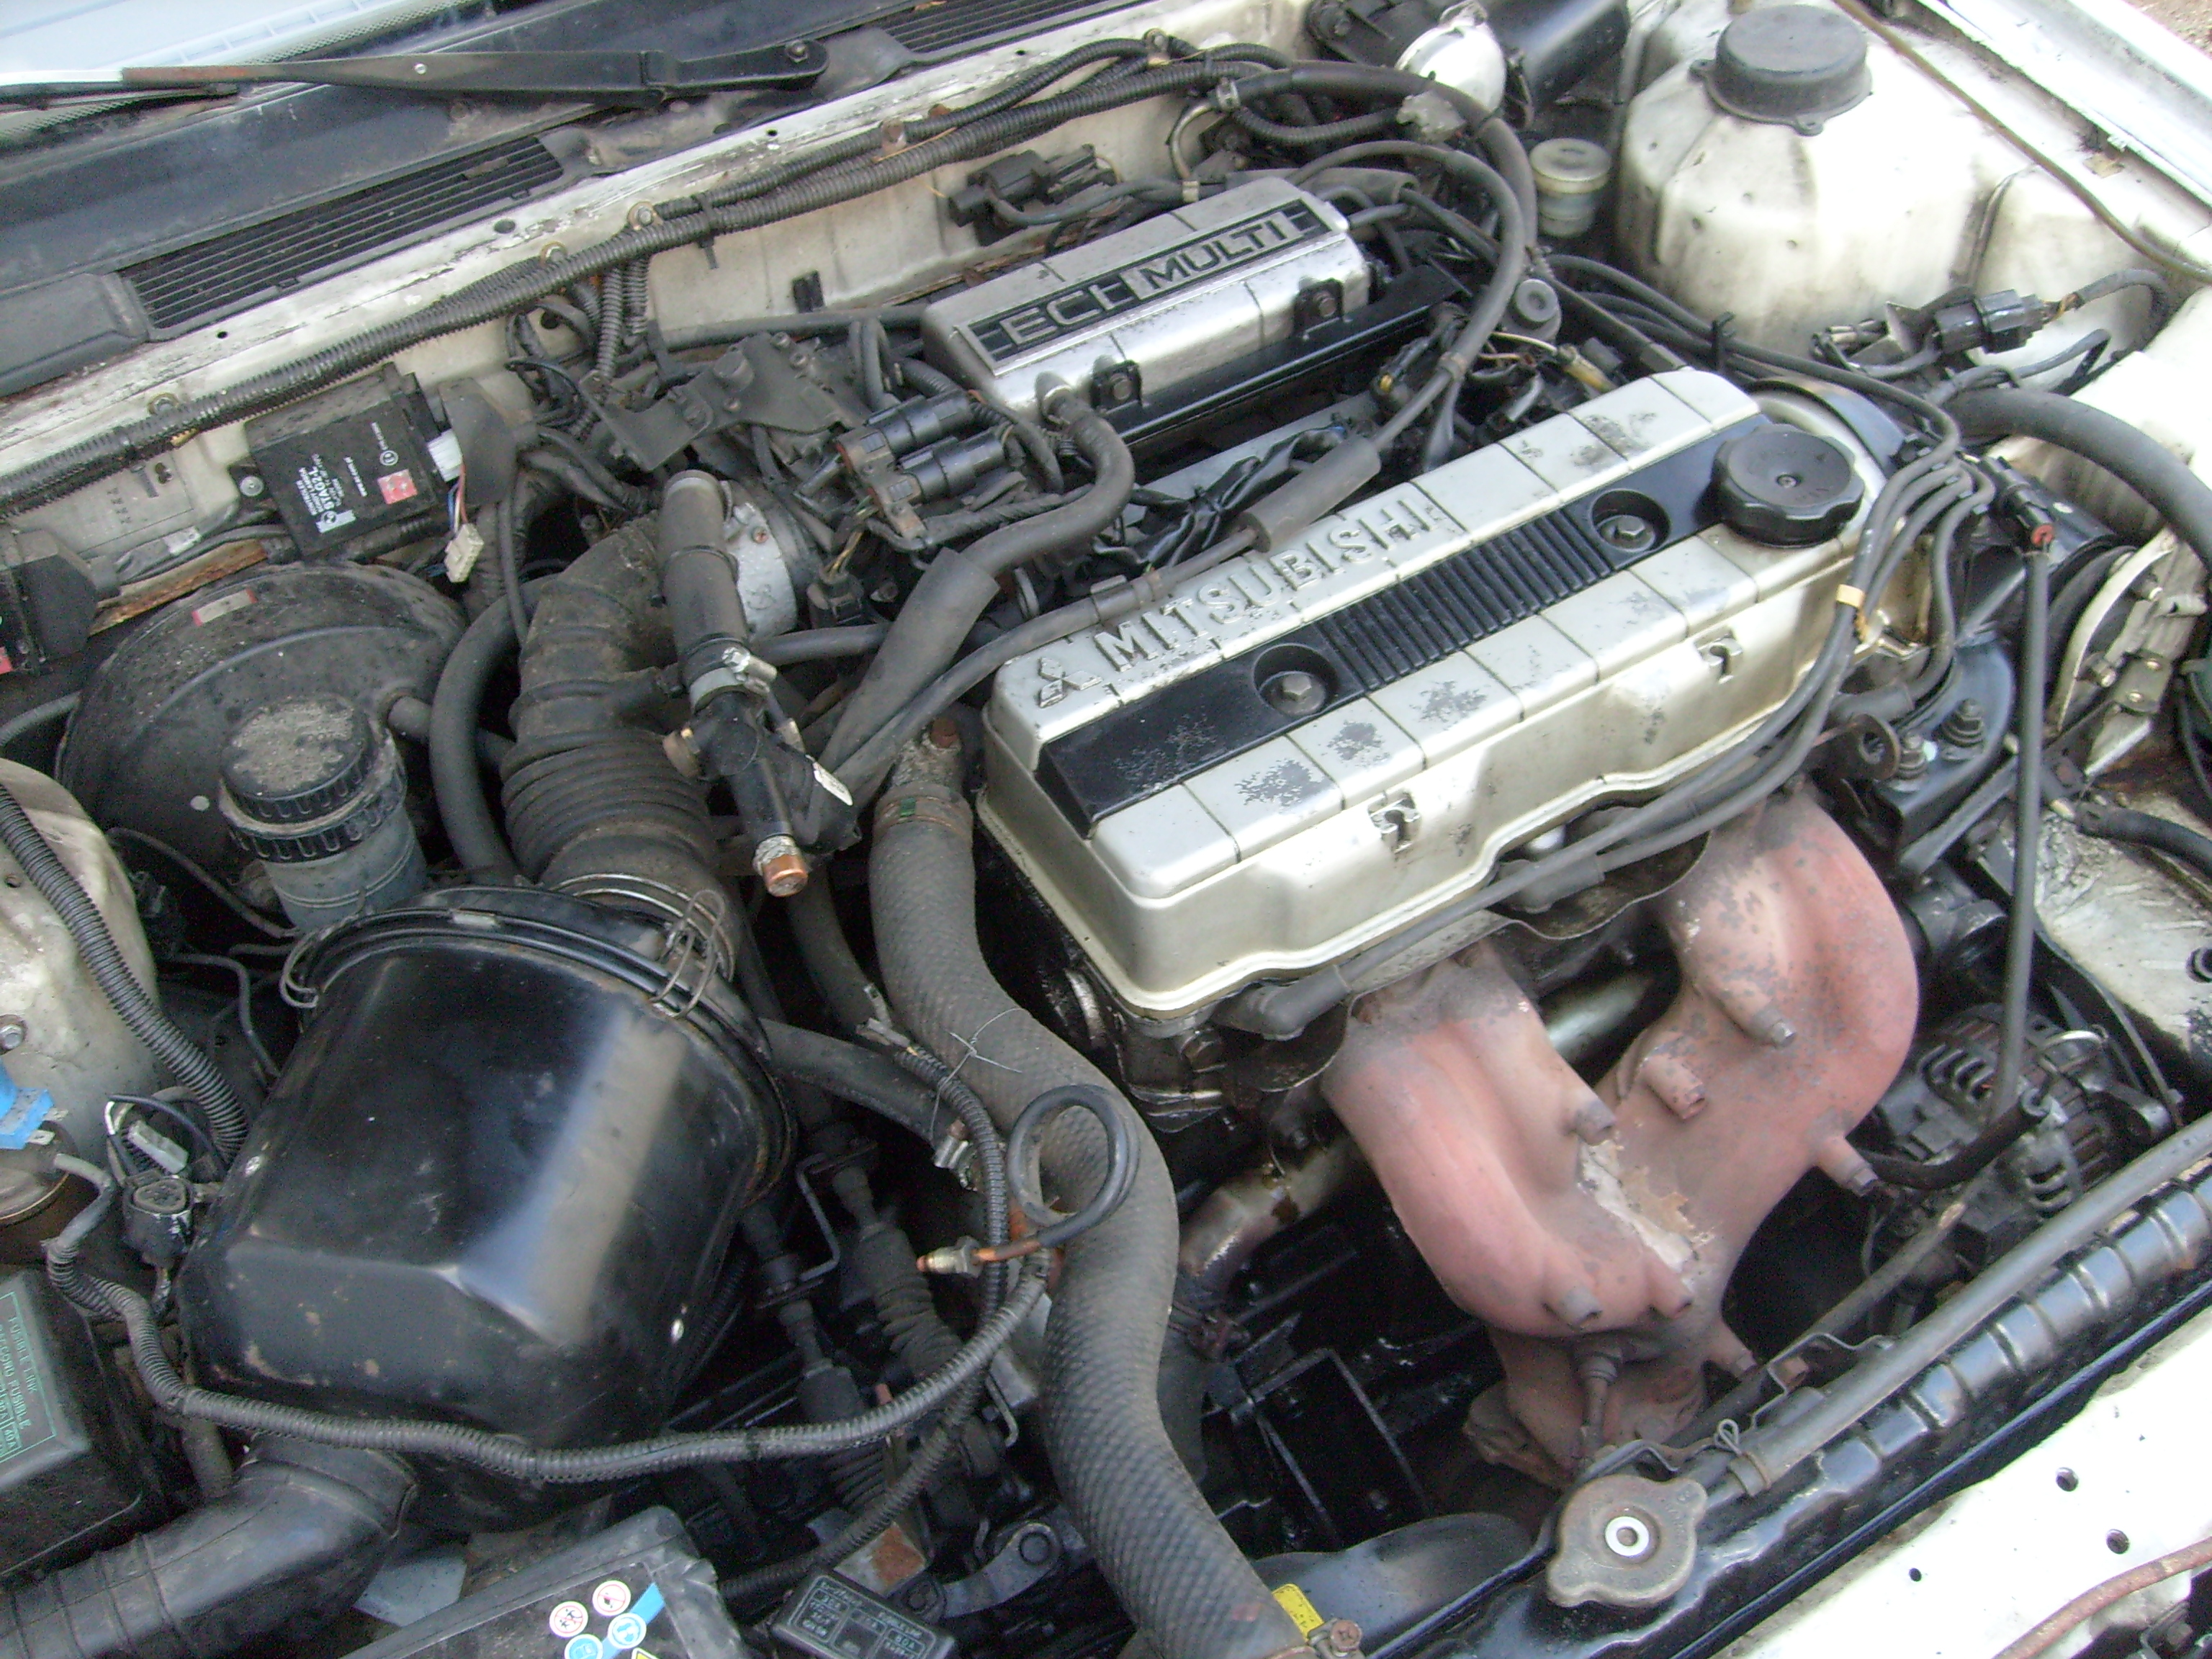 File:Mitsubishi Galant 2,4L.JPG - Wikimedia Commons